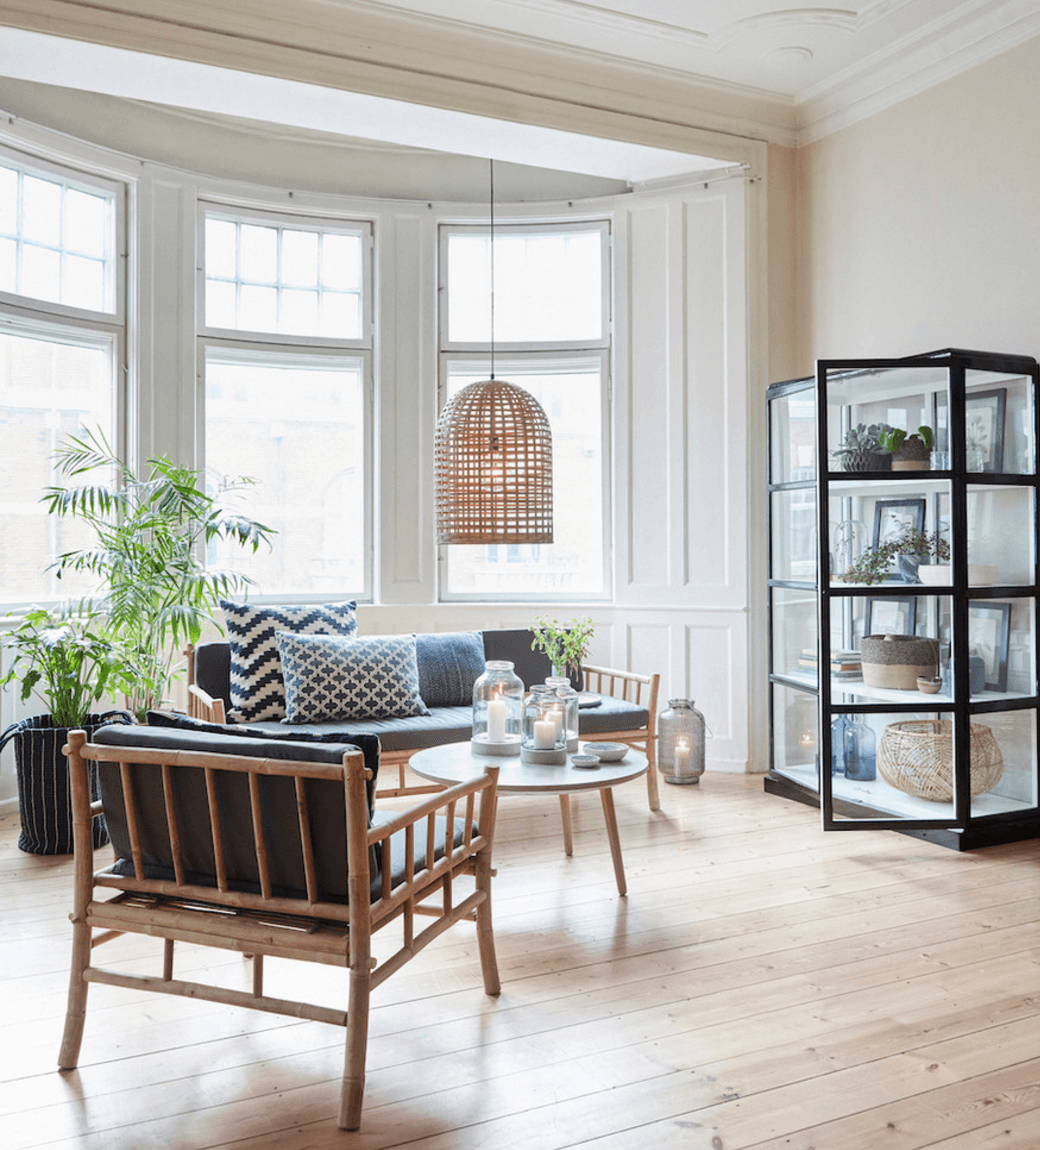 Scandinavian interior design 2015 home design design ideas design styles trends 2016